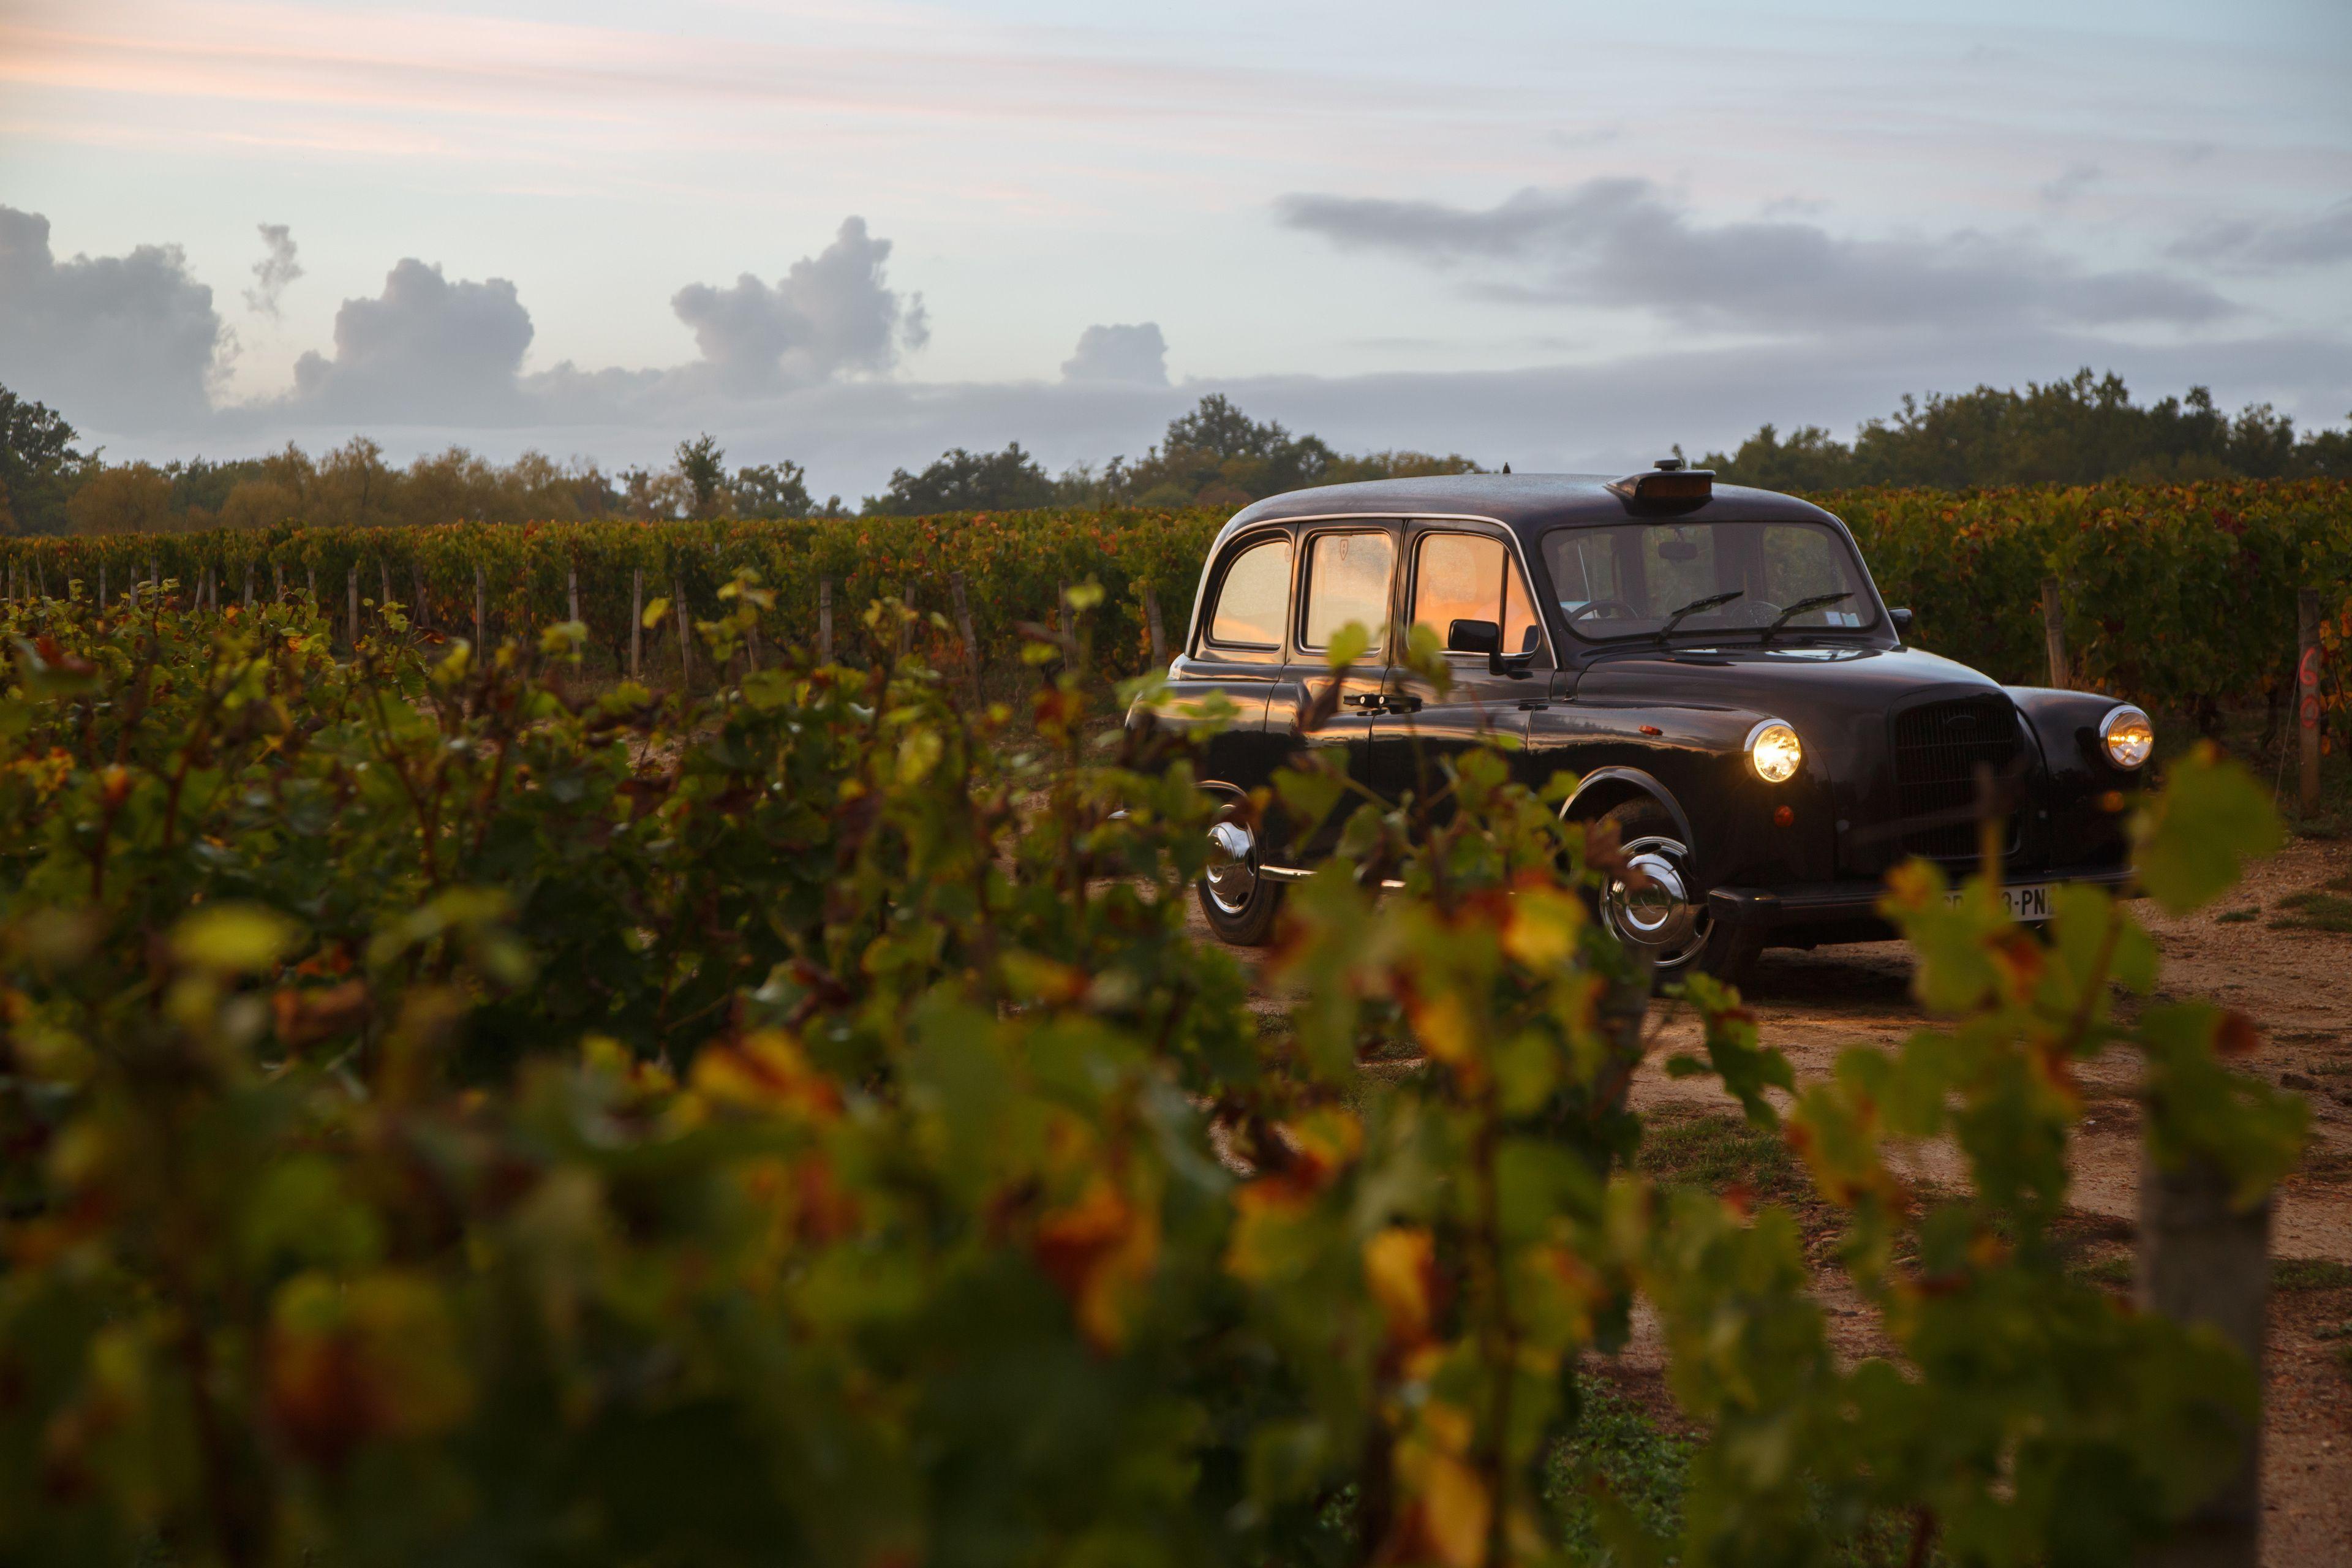 Antique car in a vineyard